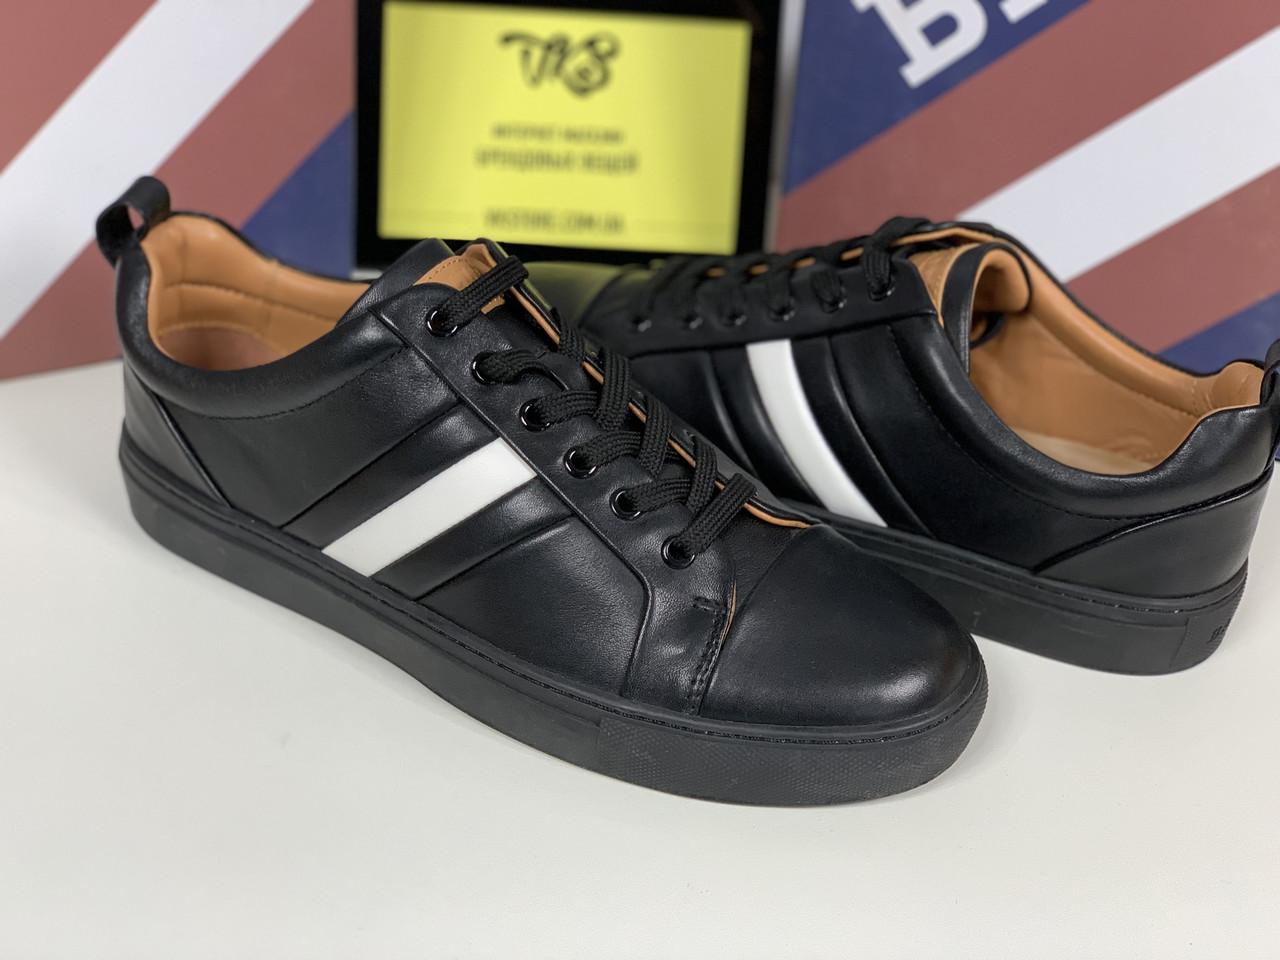 9b63b4e83 Мужская обувь Балли - Кроссовки Bally | vkstore.com.ua